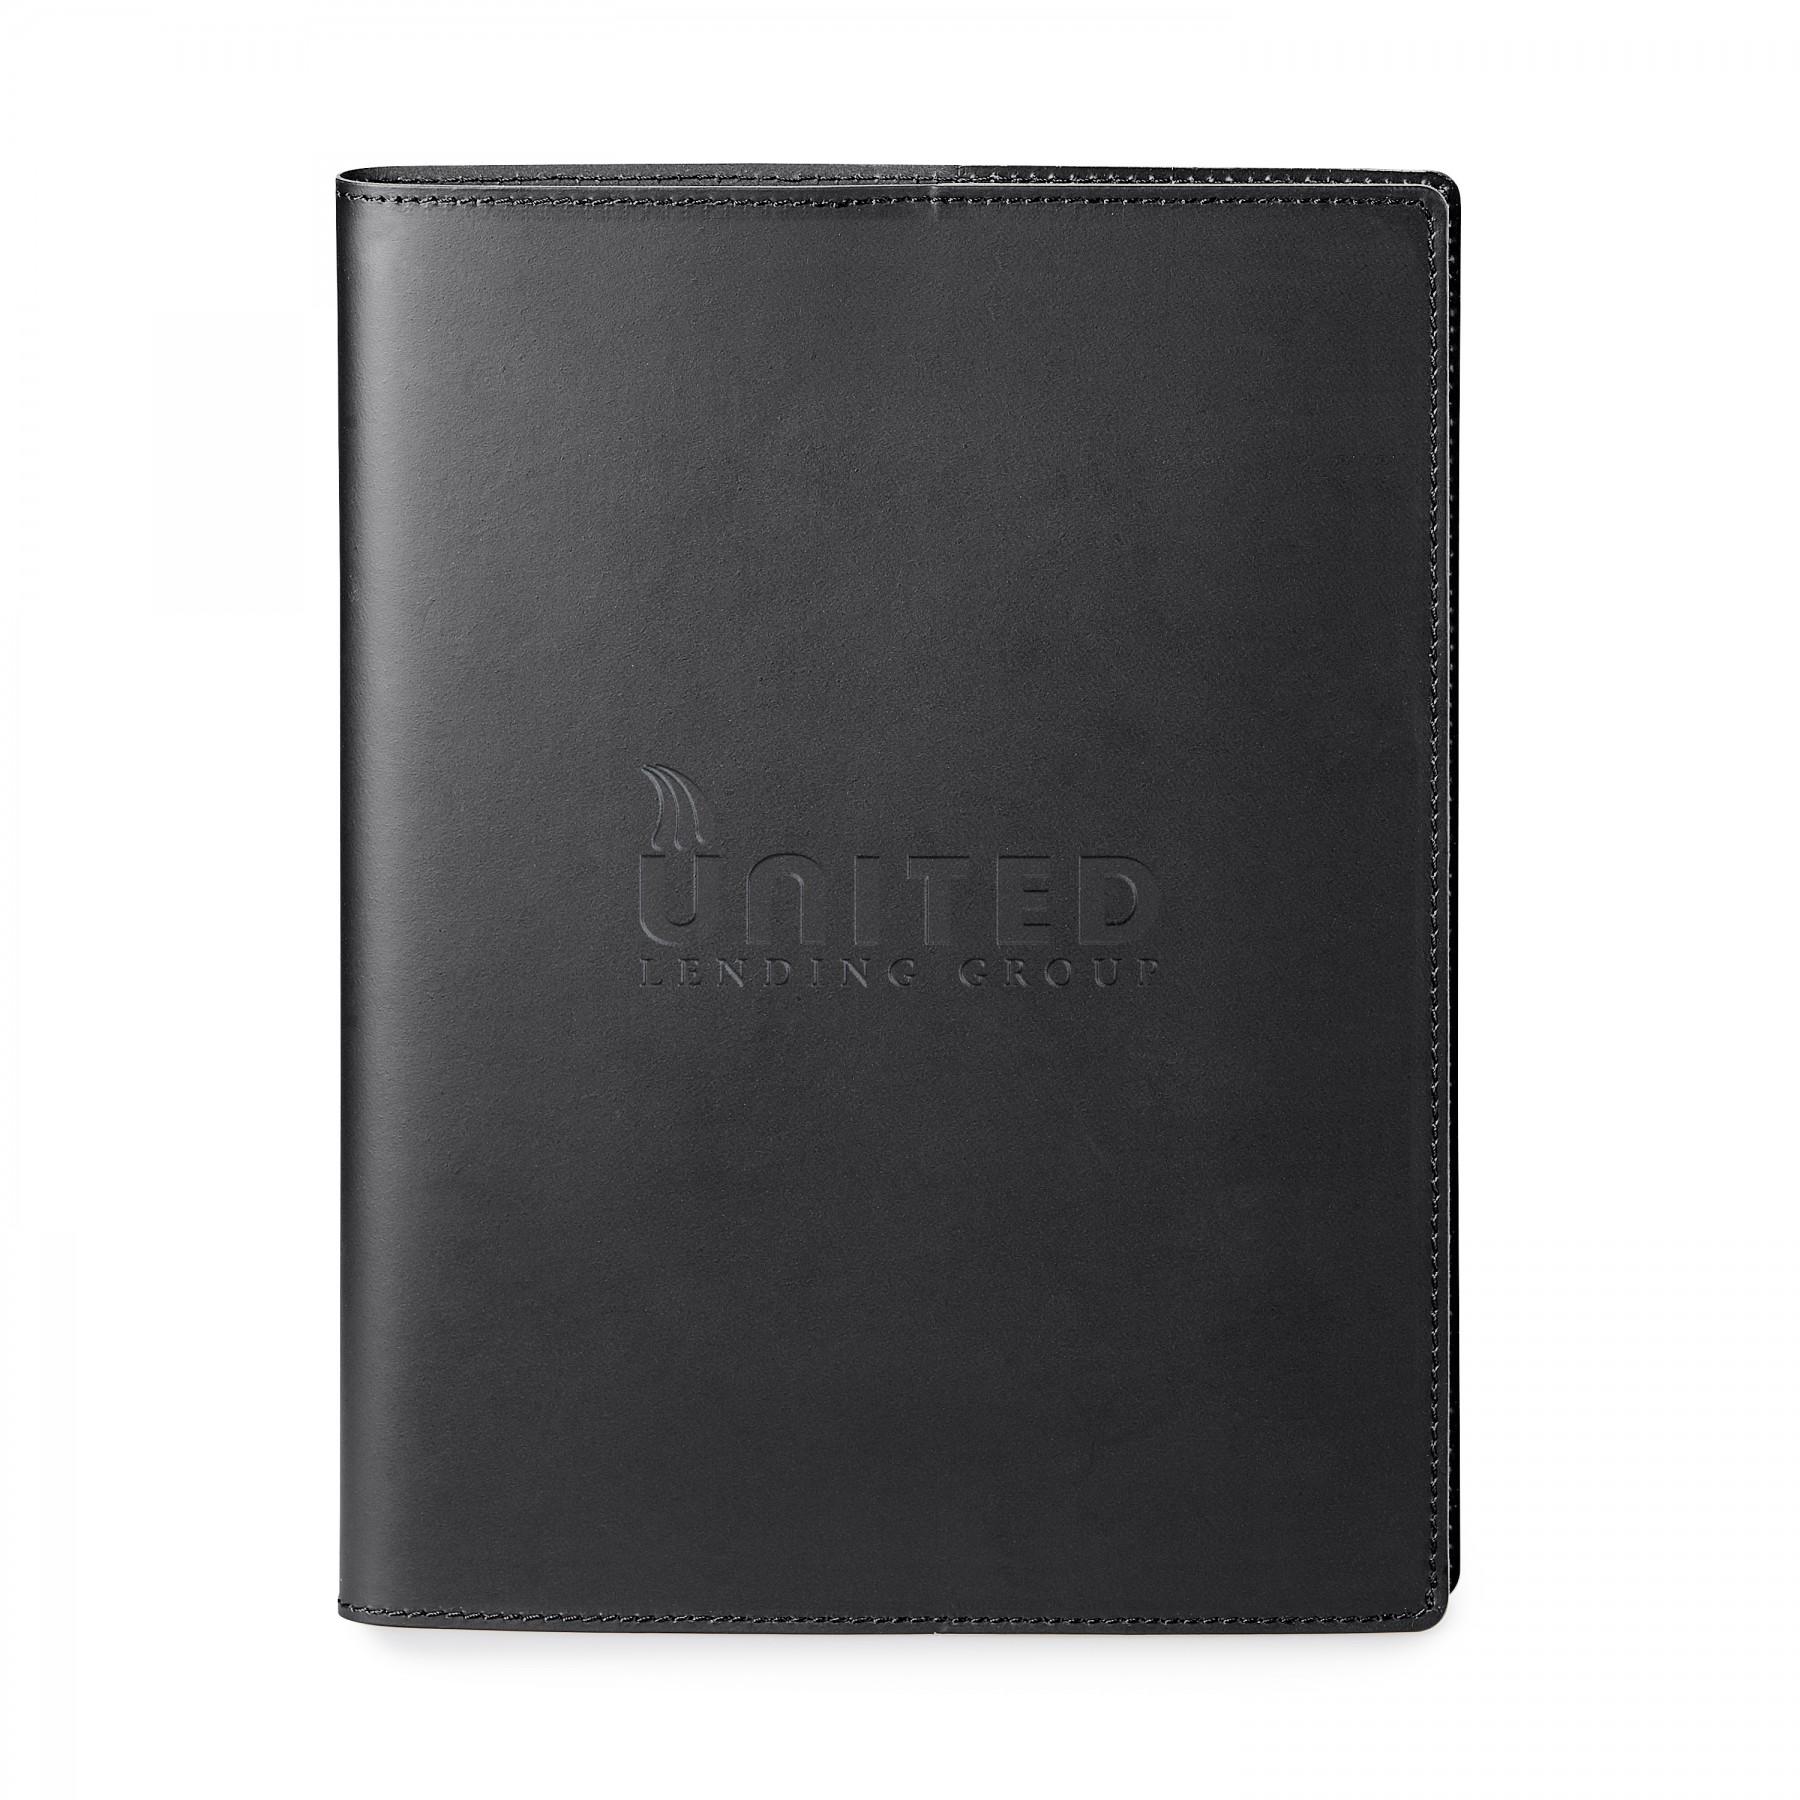 Giuseppe Di Natale Refillable Leather Journal - Debossed Imprint (ST603)